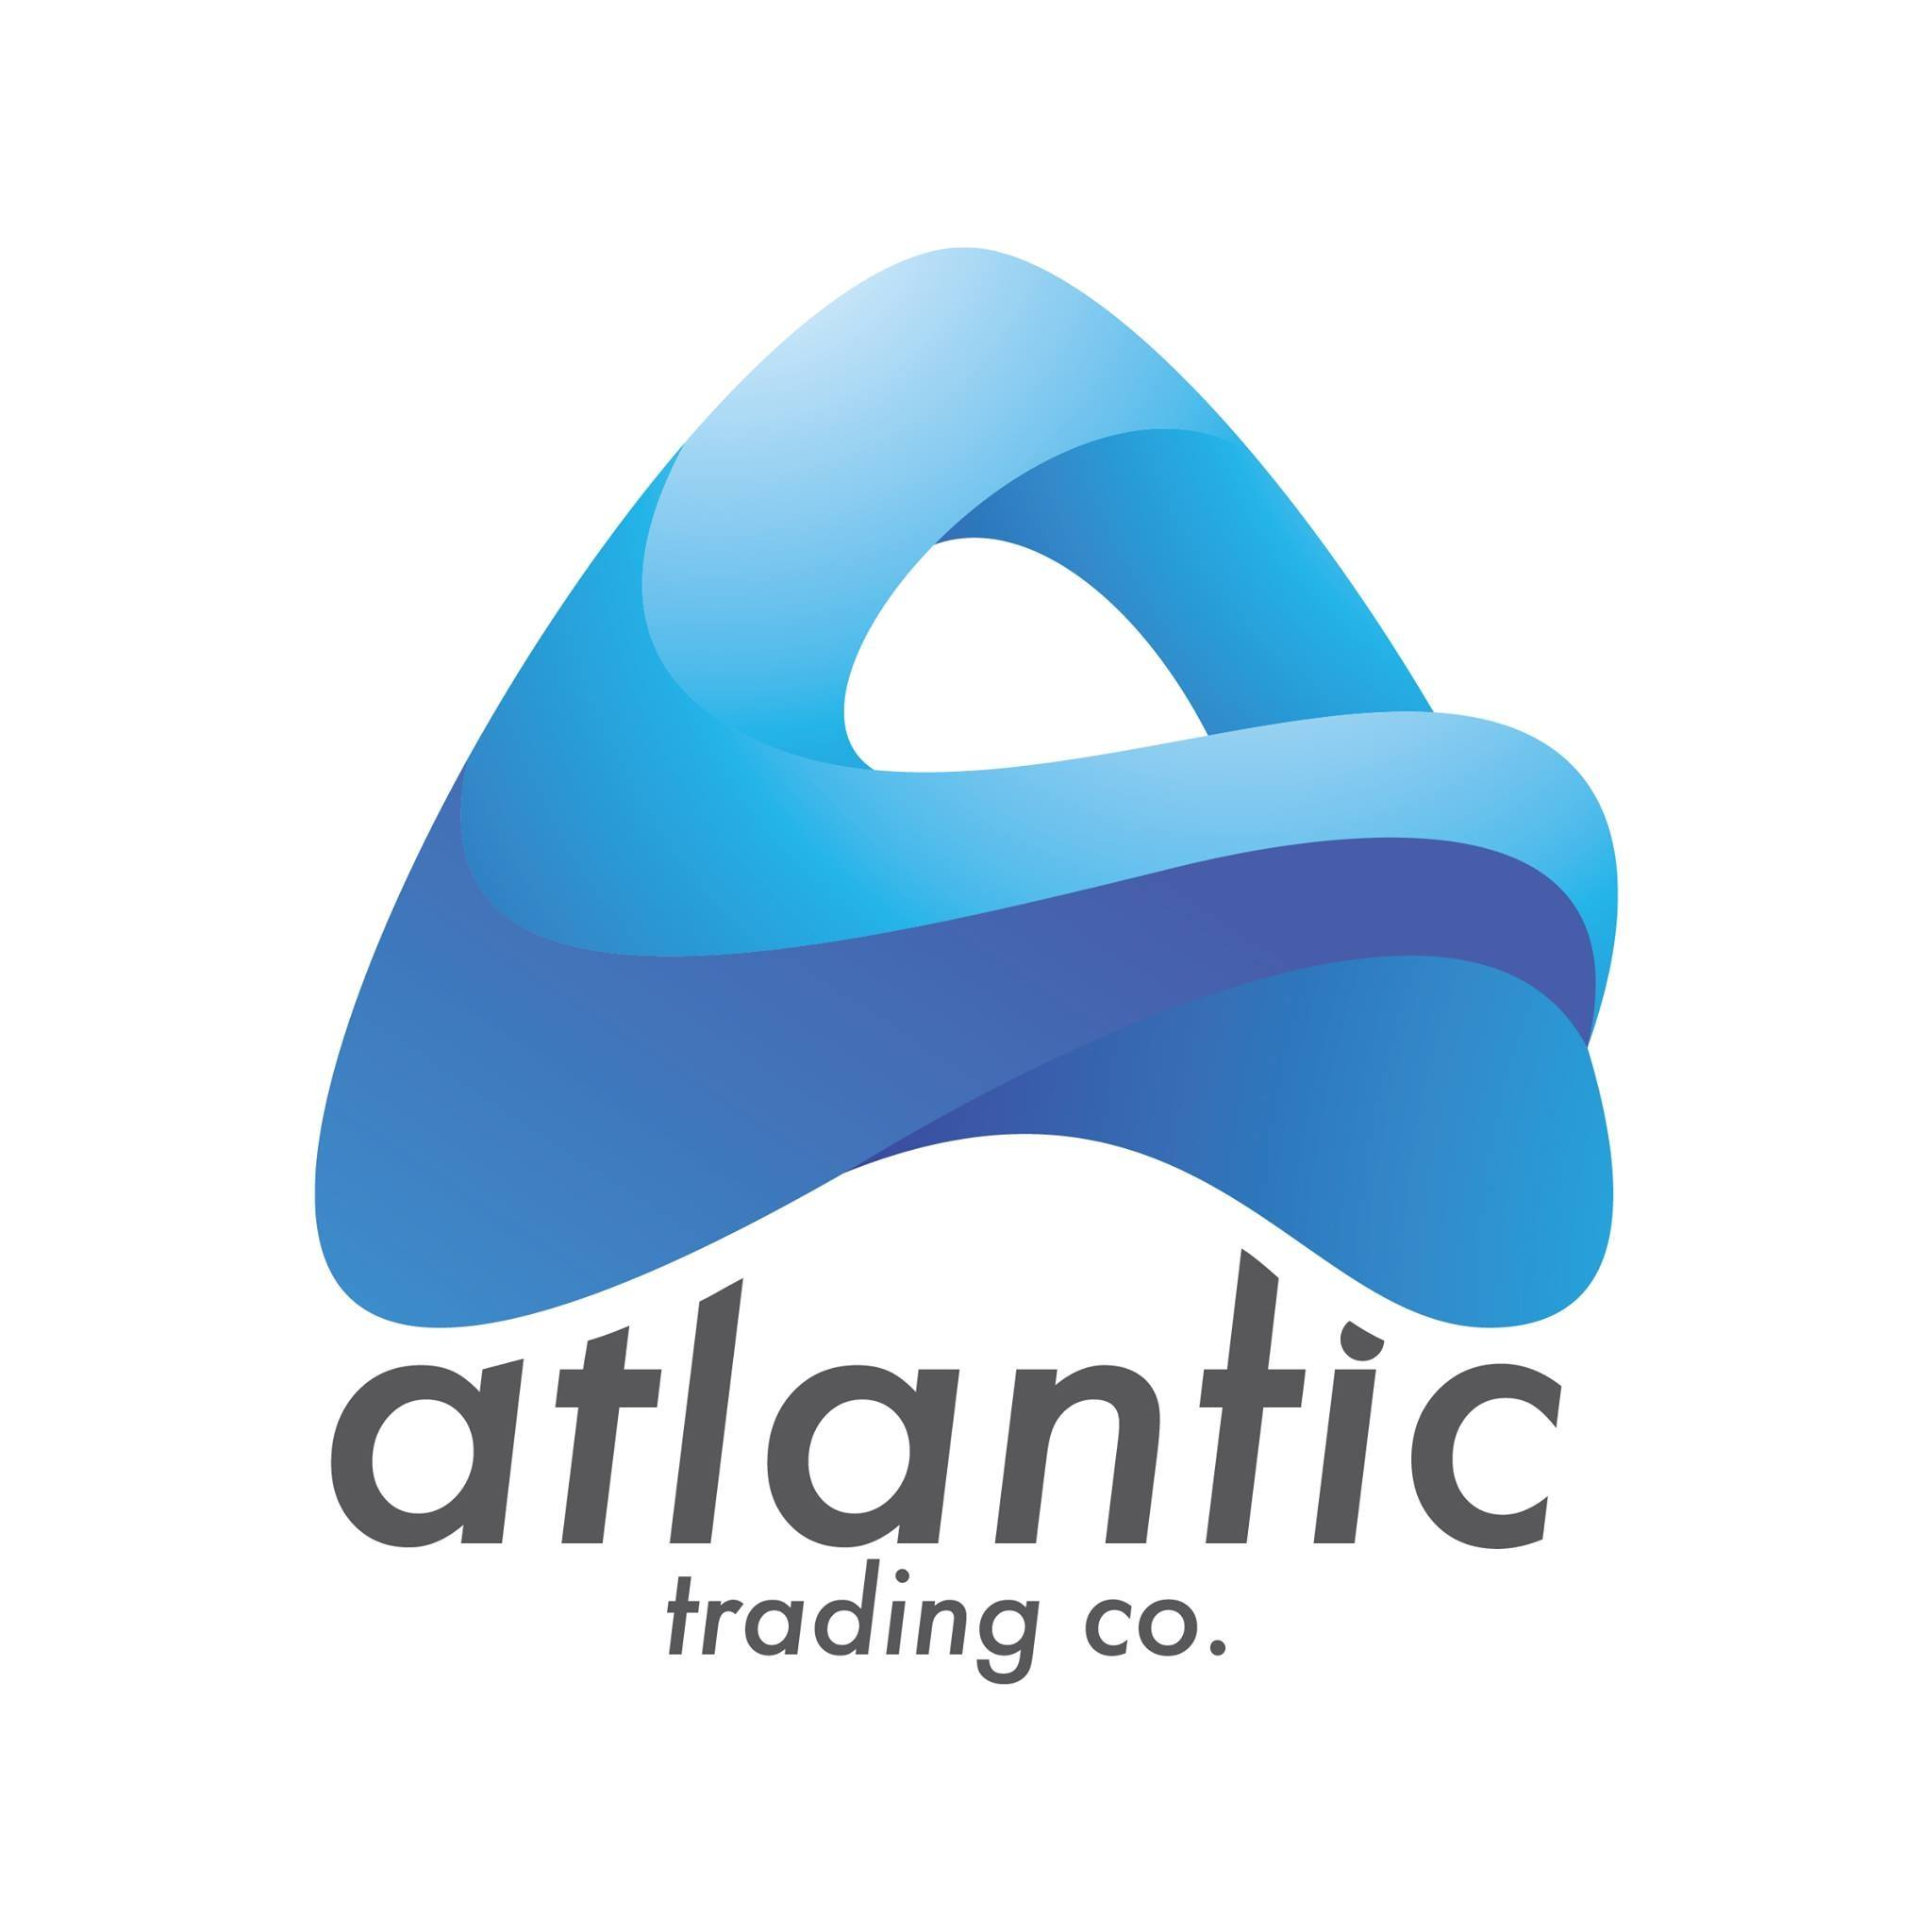 Atlantic Trading Co. Ltd